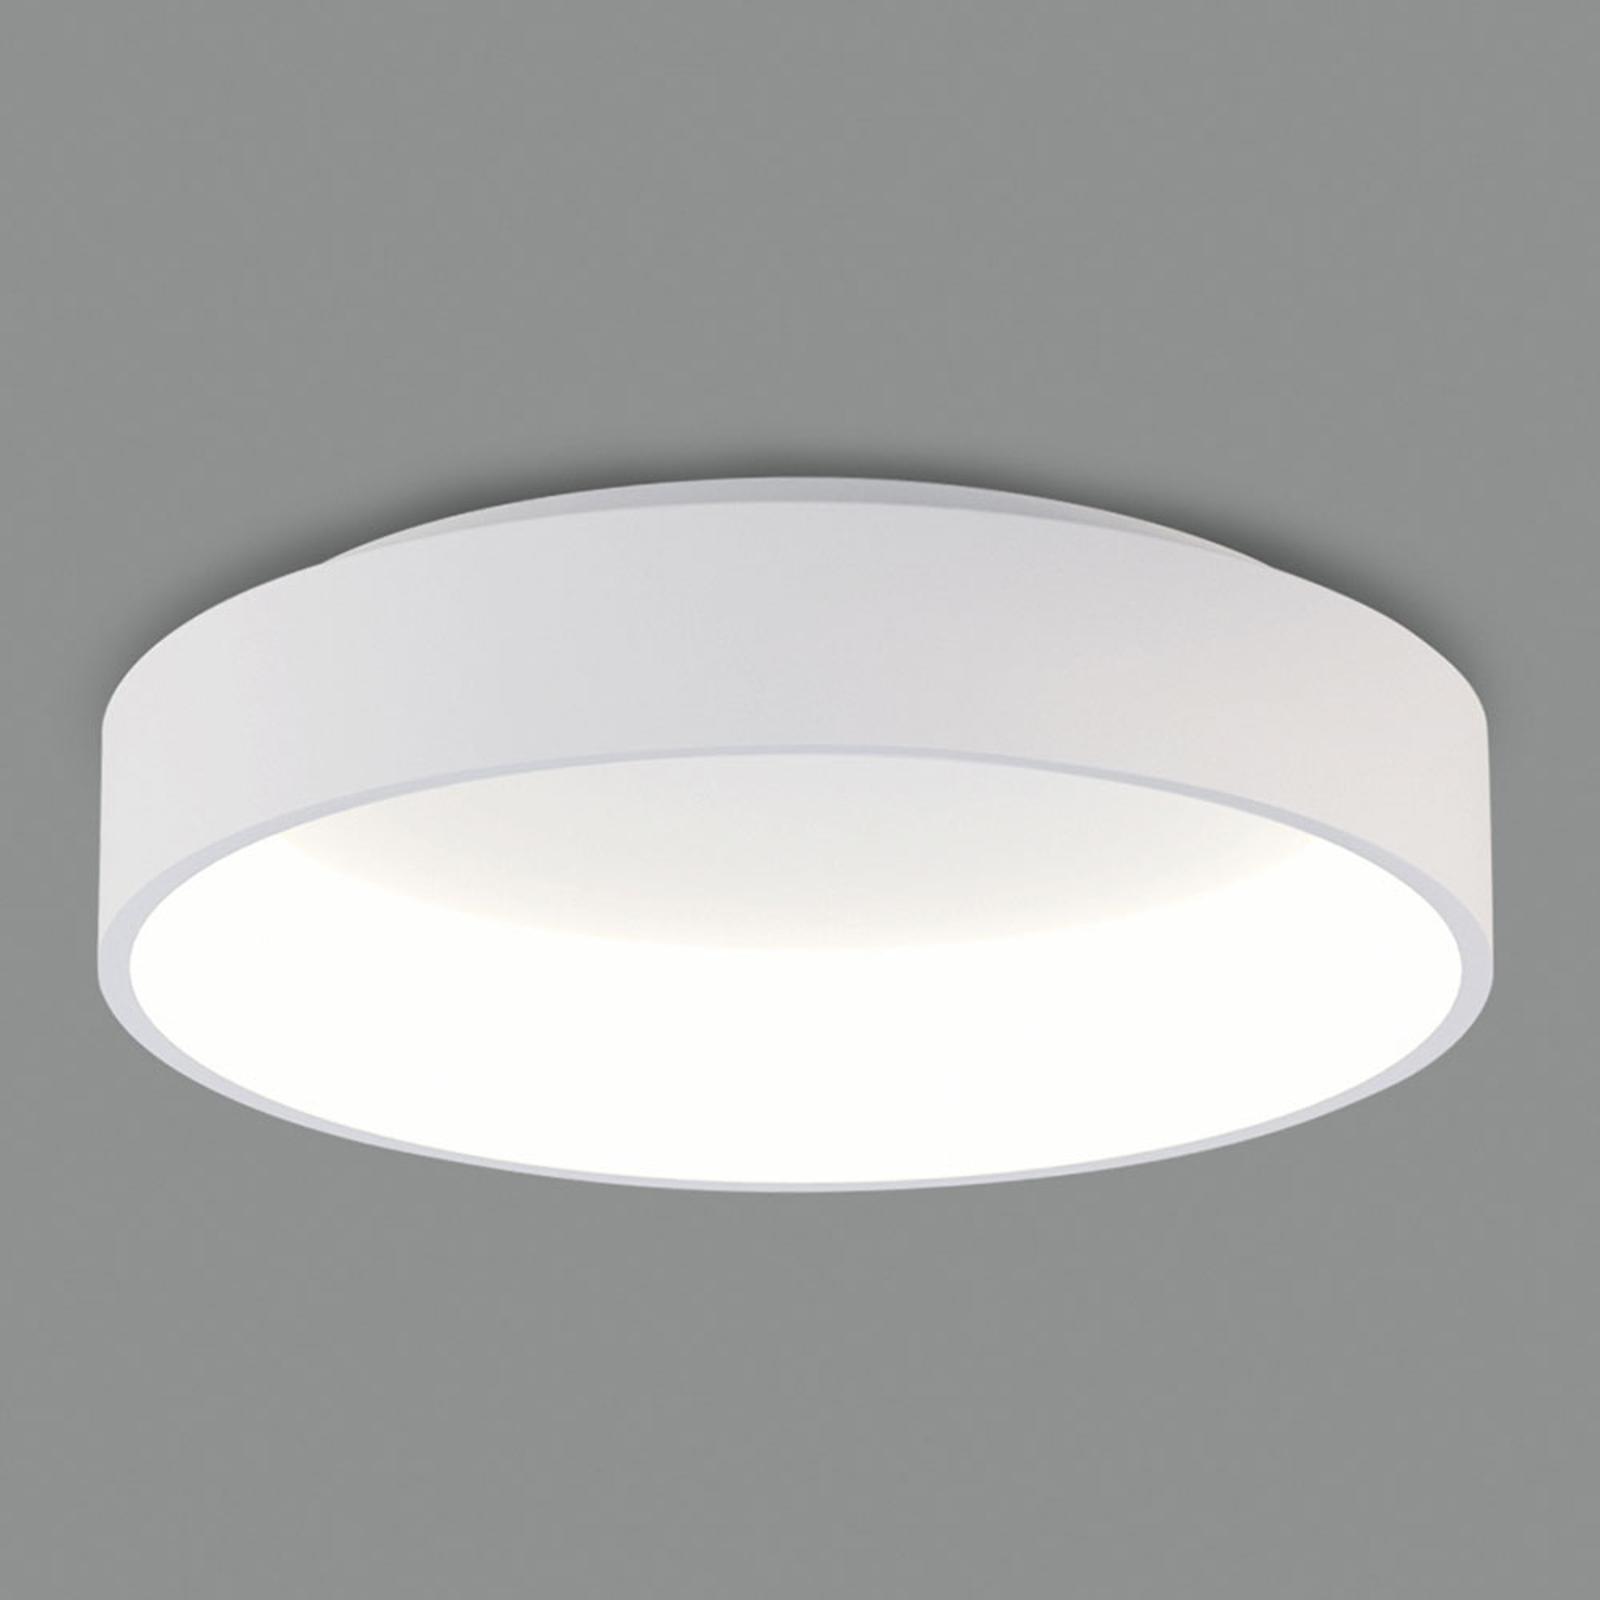 LED plafondlamp Dilga DALI Ø 60cm Casambi